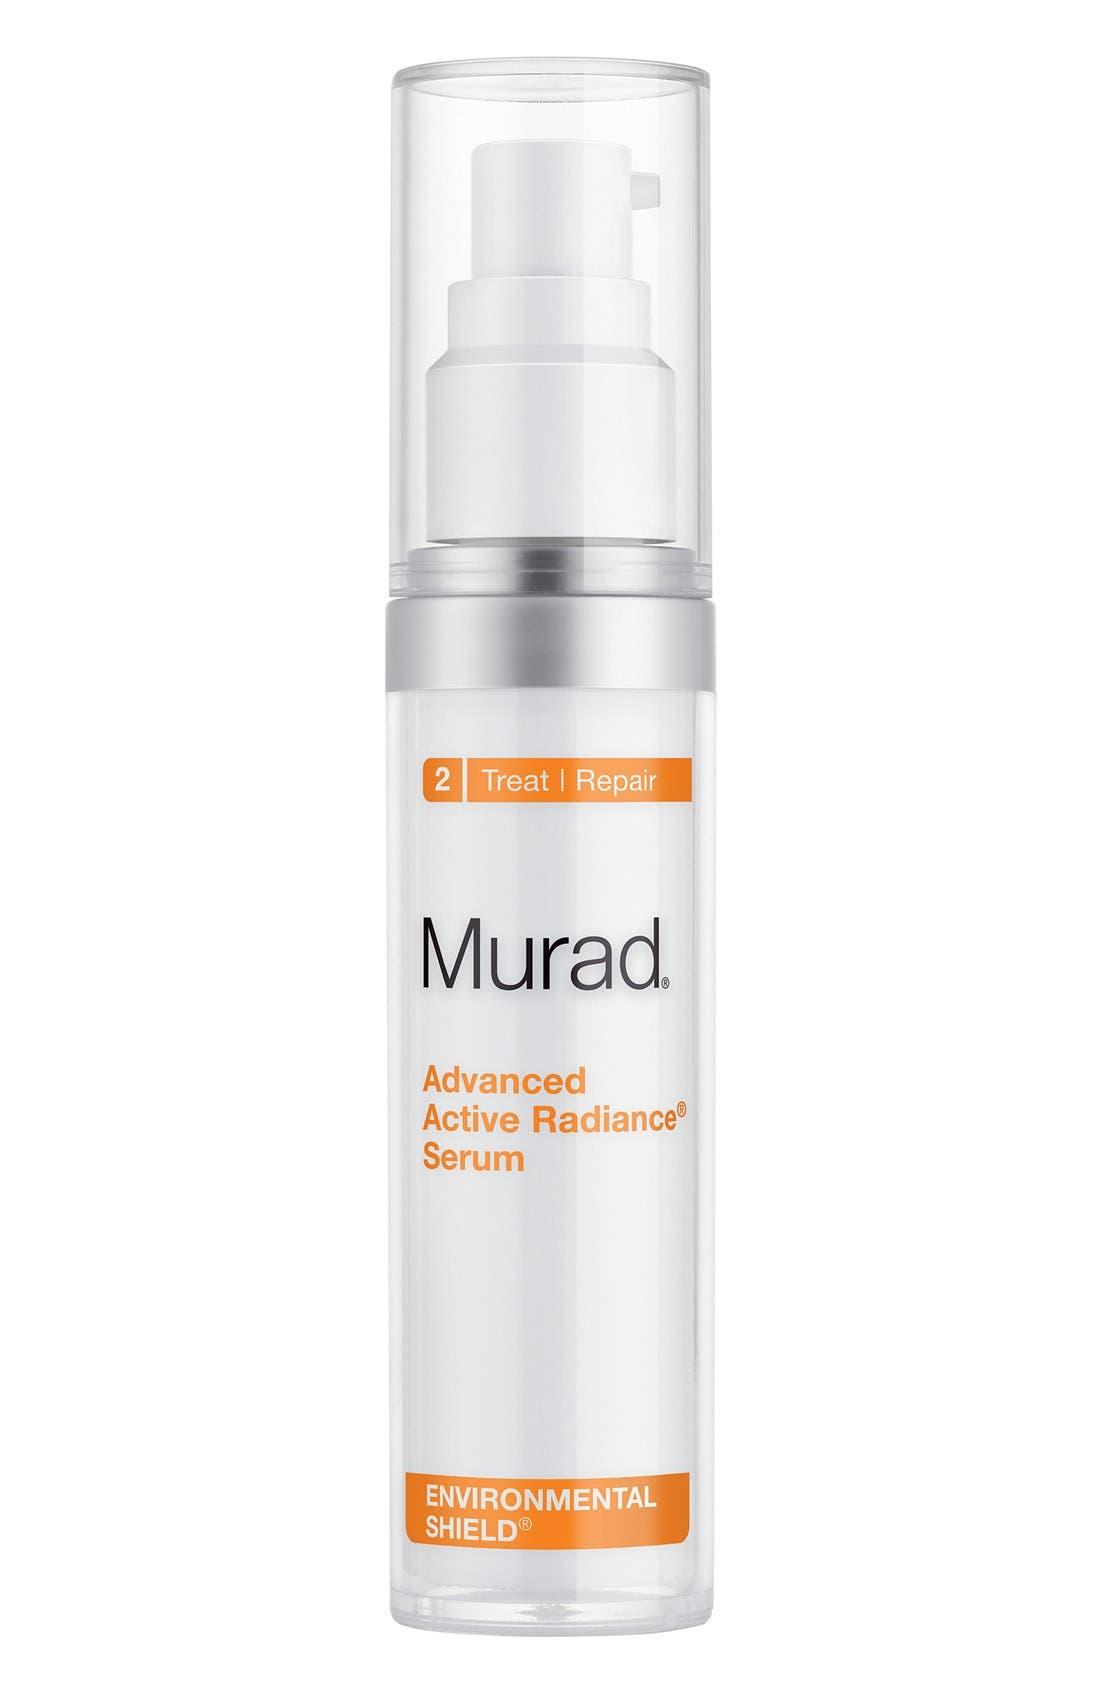 Murad® 'Advanced Active Radiance®' Serum